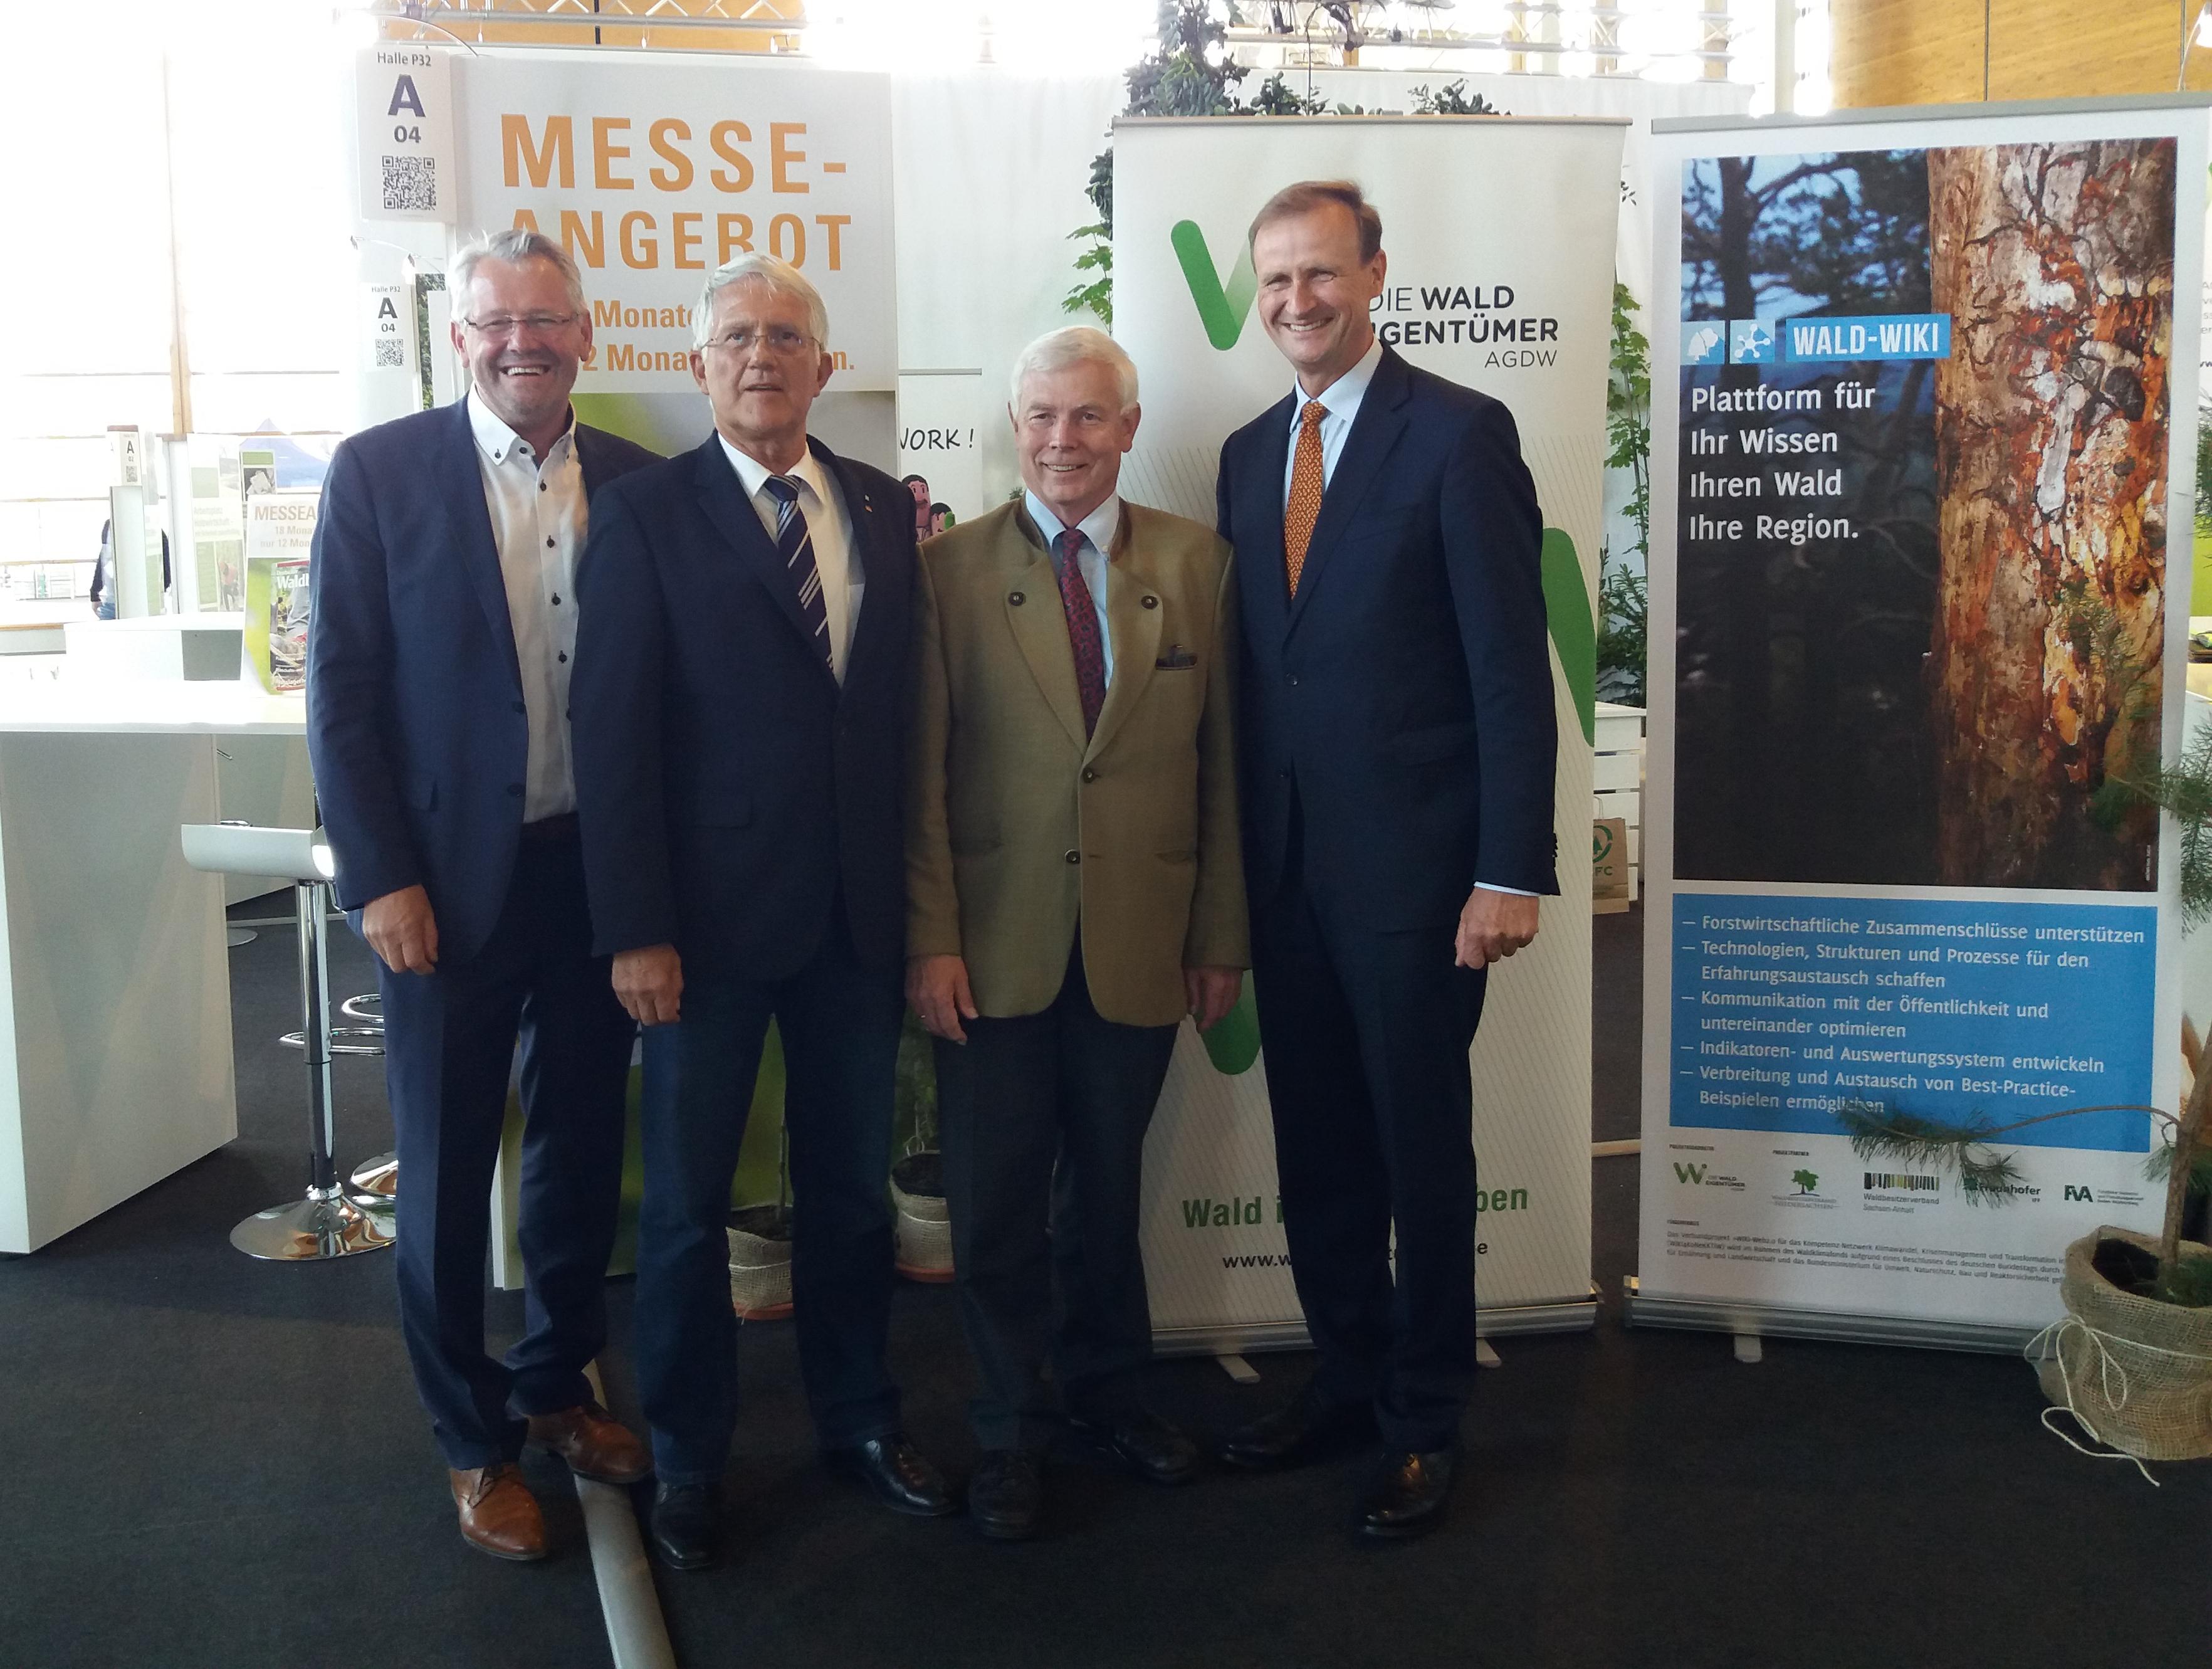 MdBs, DFWR und AGDW-Präsidium am Stand